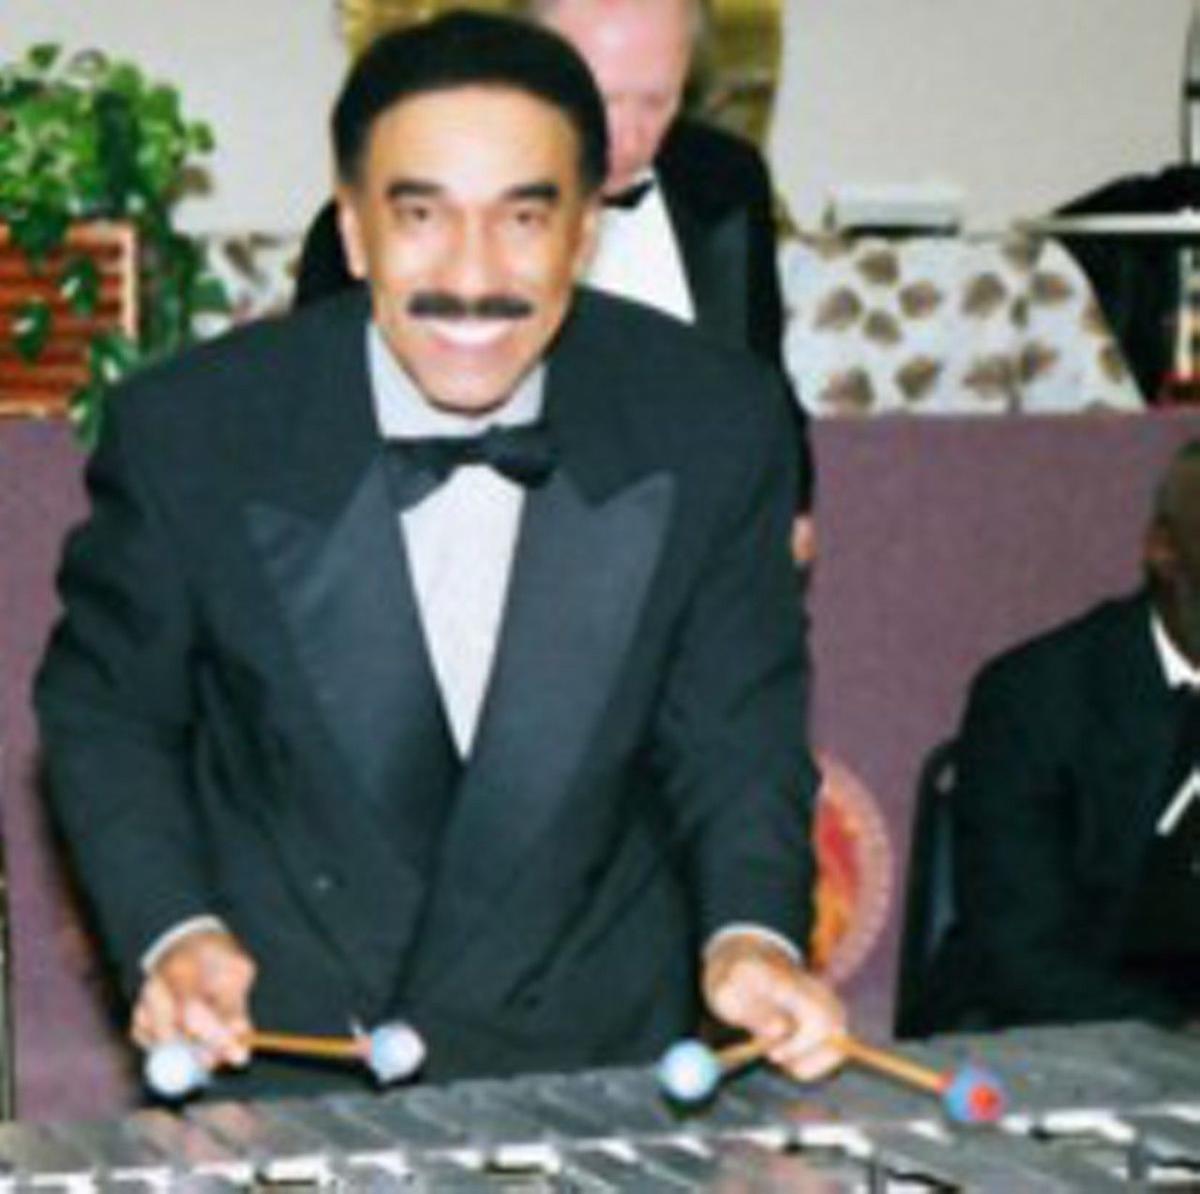 R.I.P vibraphonist Billy Wooten